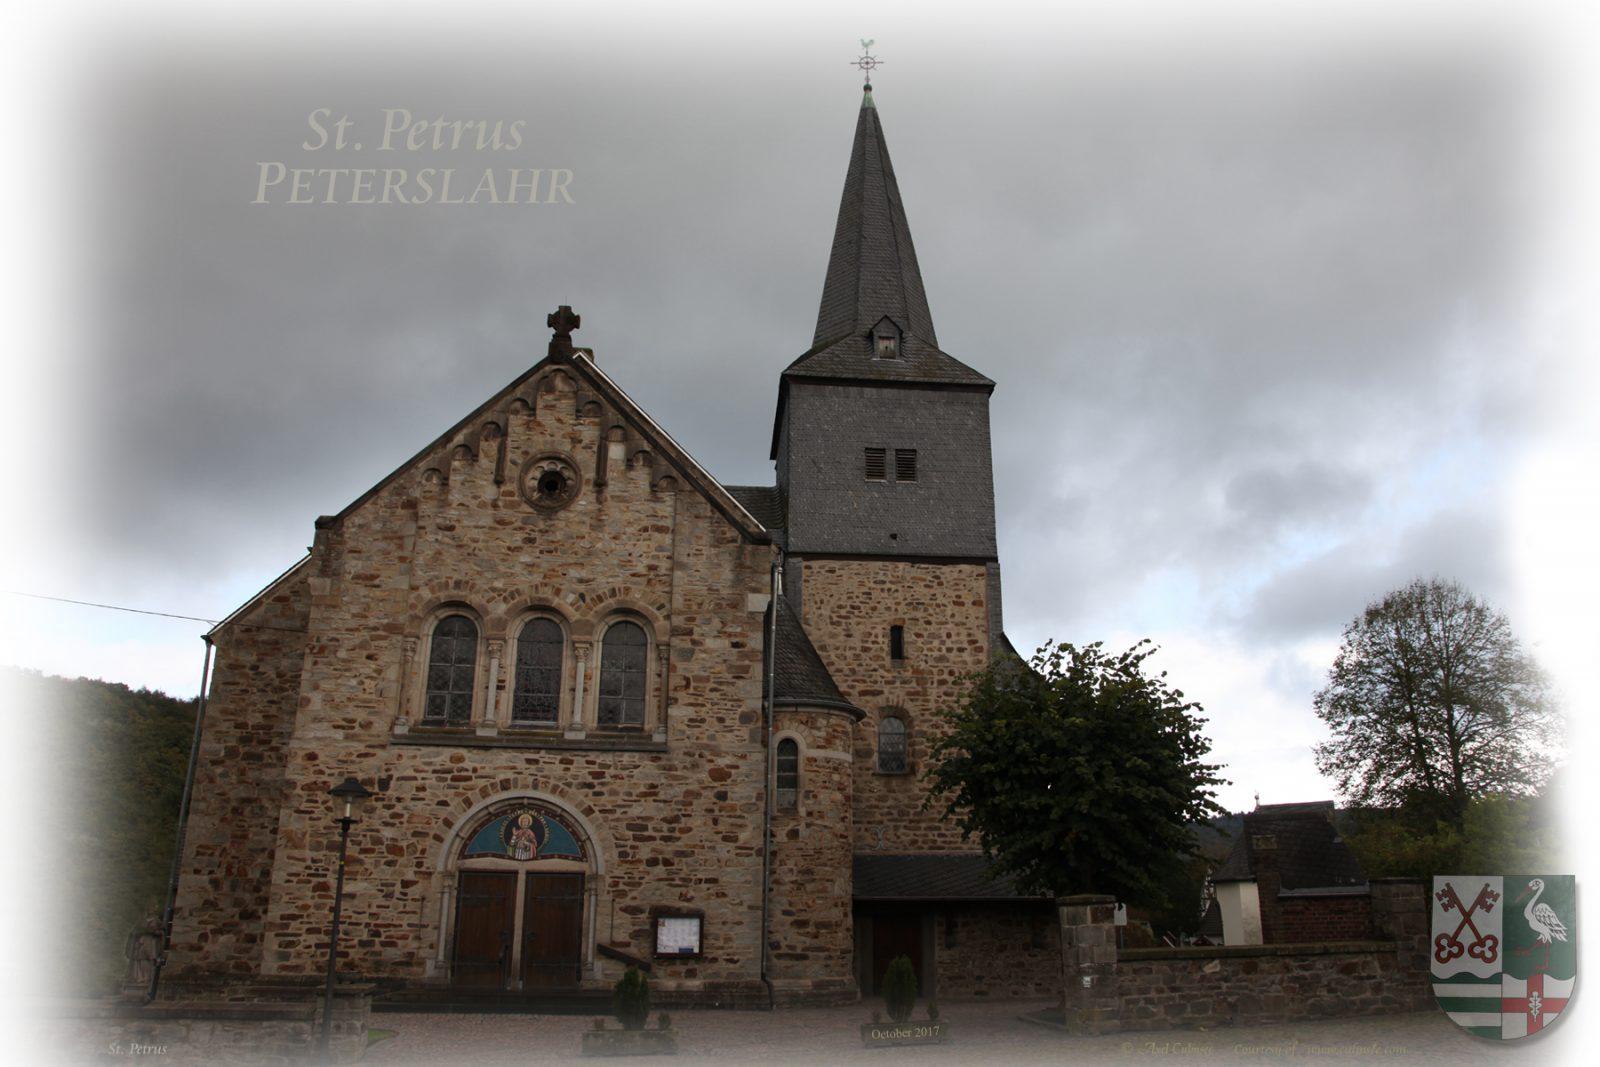 Peterslahr Kirche St. Petrus Original